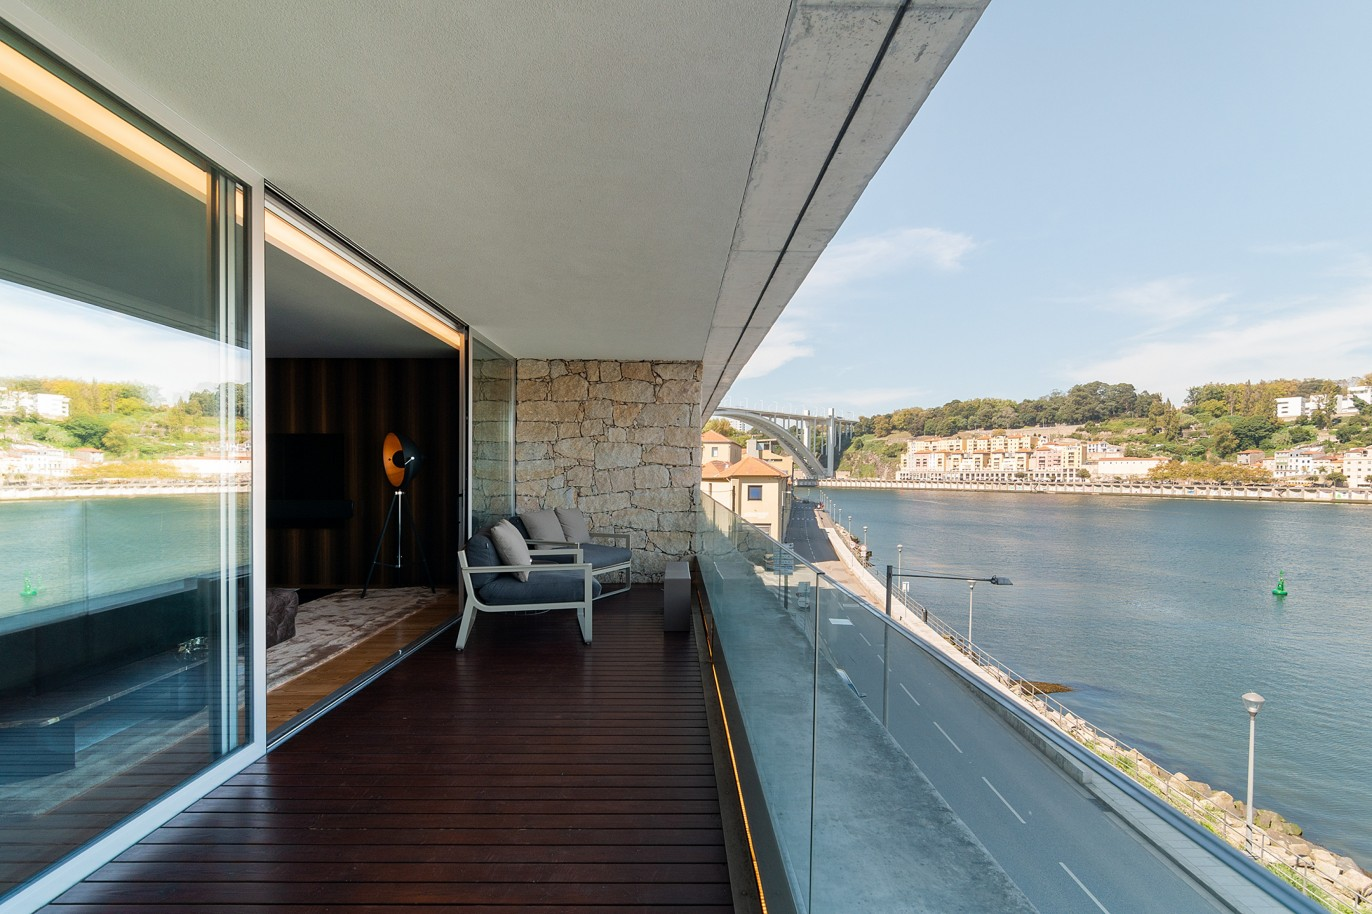 sale-of-luxury-apartment-with-river-views-v-n-gaia-porto-portugal